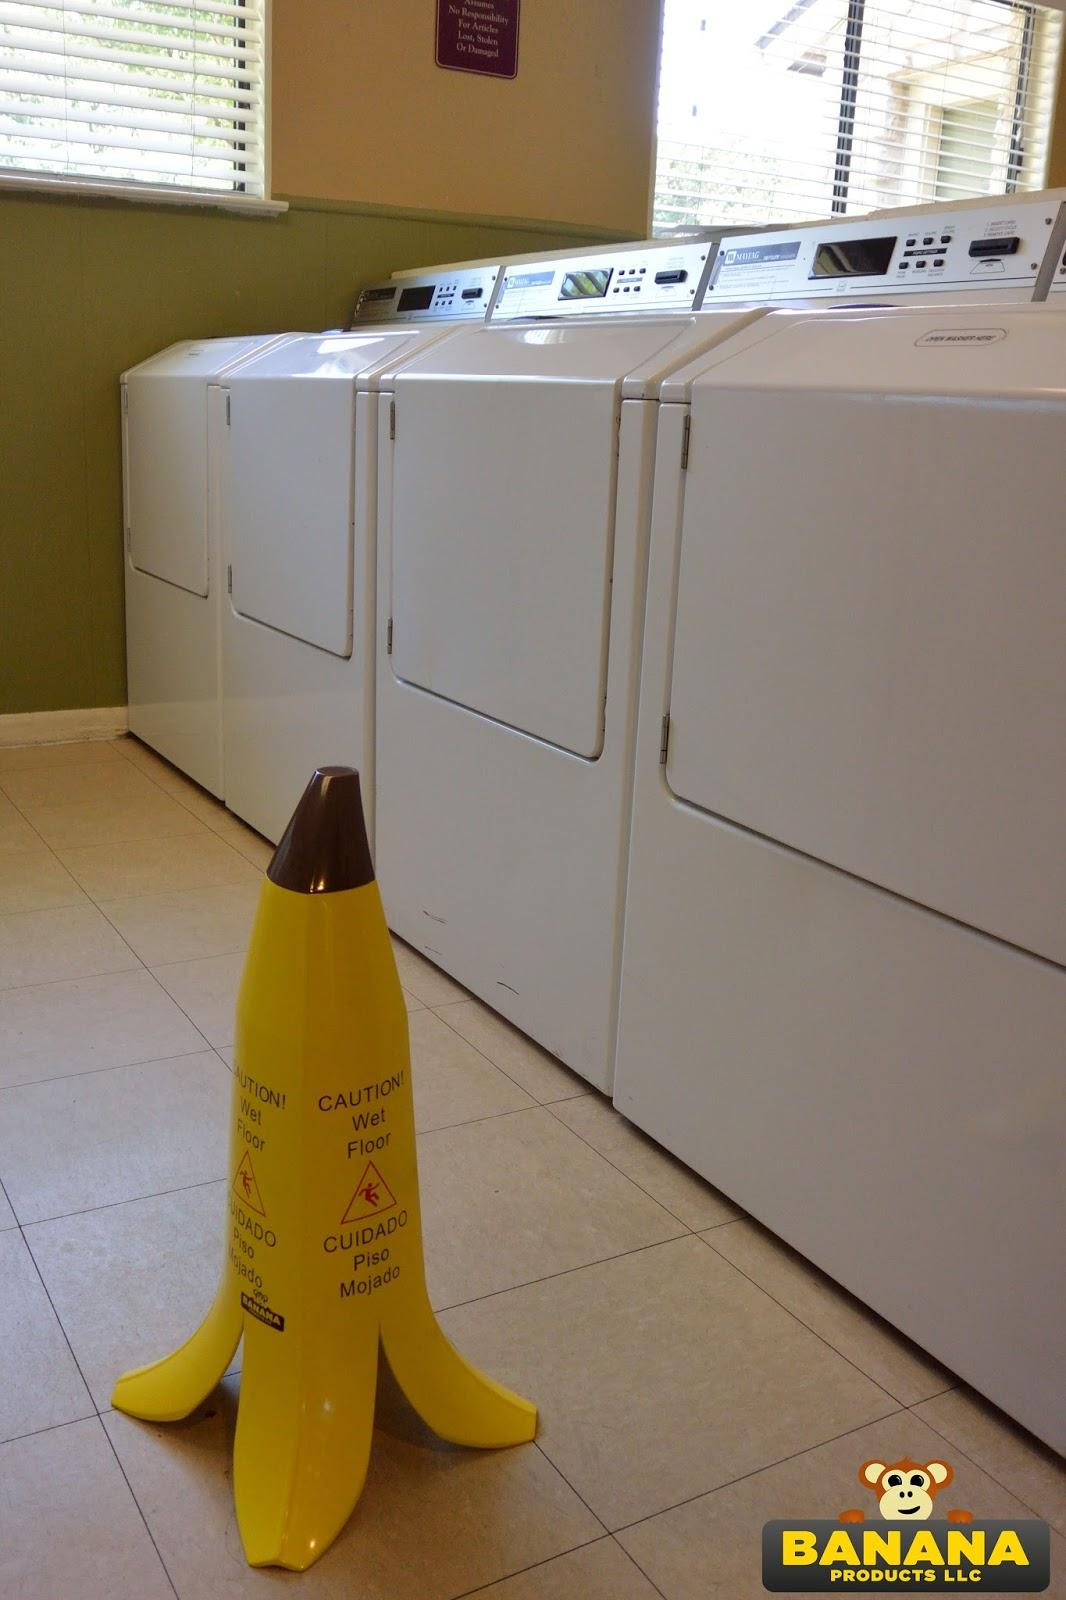 banana peel as an alternative floor polisher Find floor scrubber in canada | visit kijiji classifieds to buy,  compact floor machine auto scrubber floor polisher  as a real alternative.